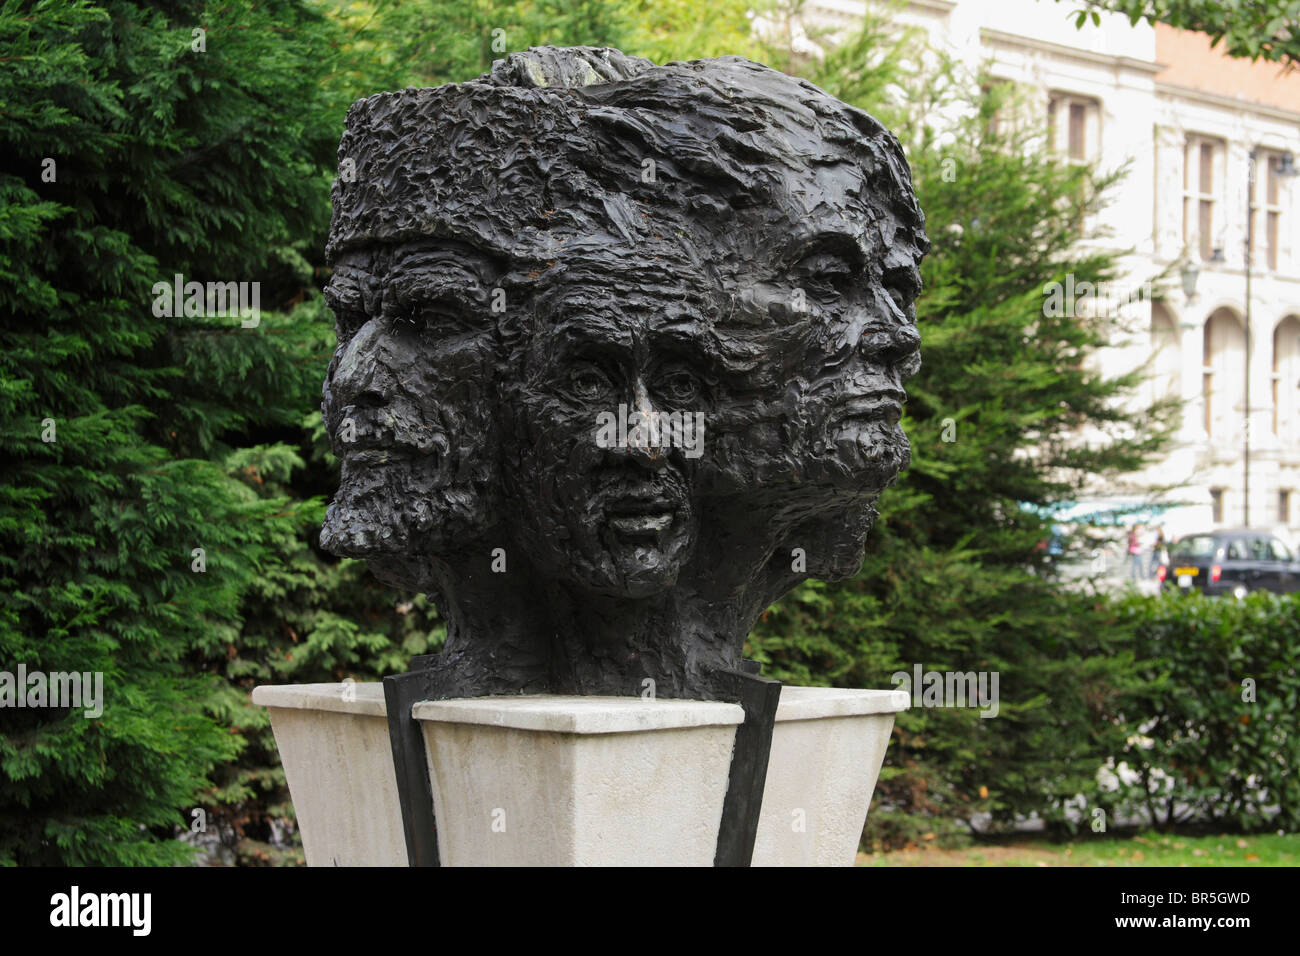 Twelve faces of man bronze statue, South Kensington, London UK Stock Photo